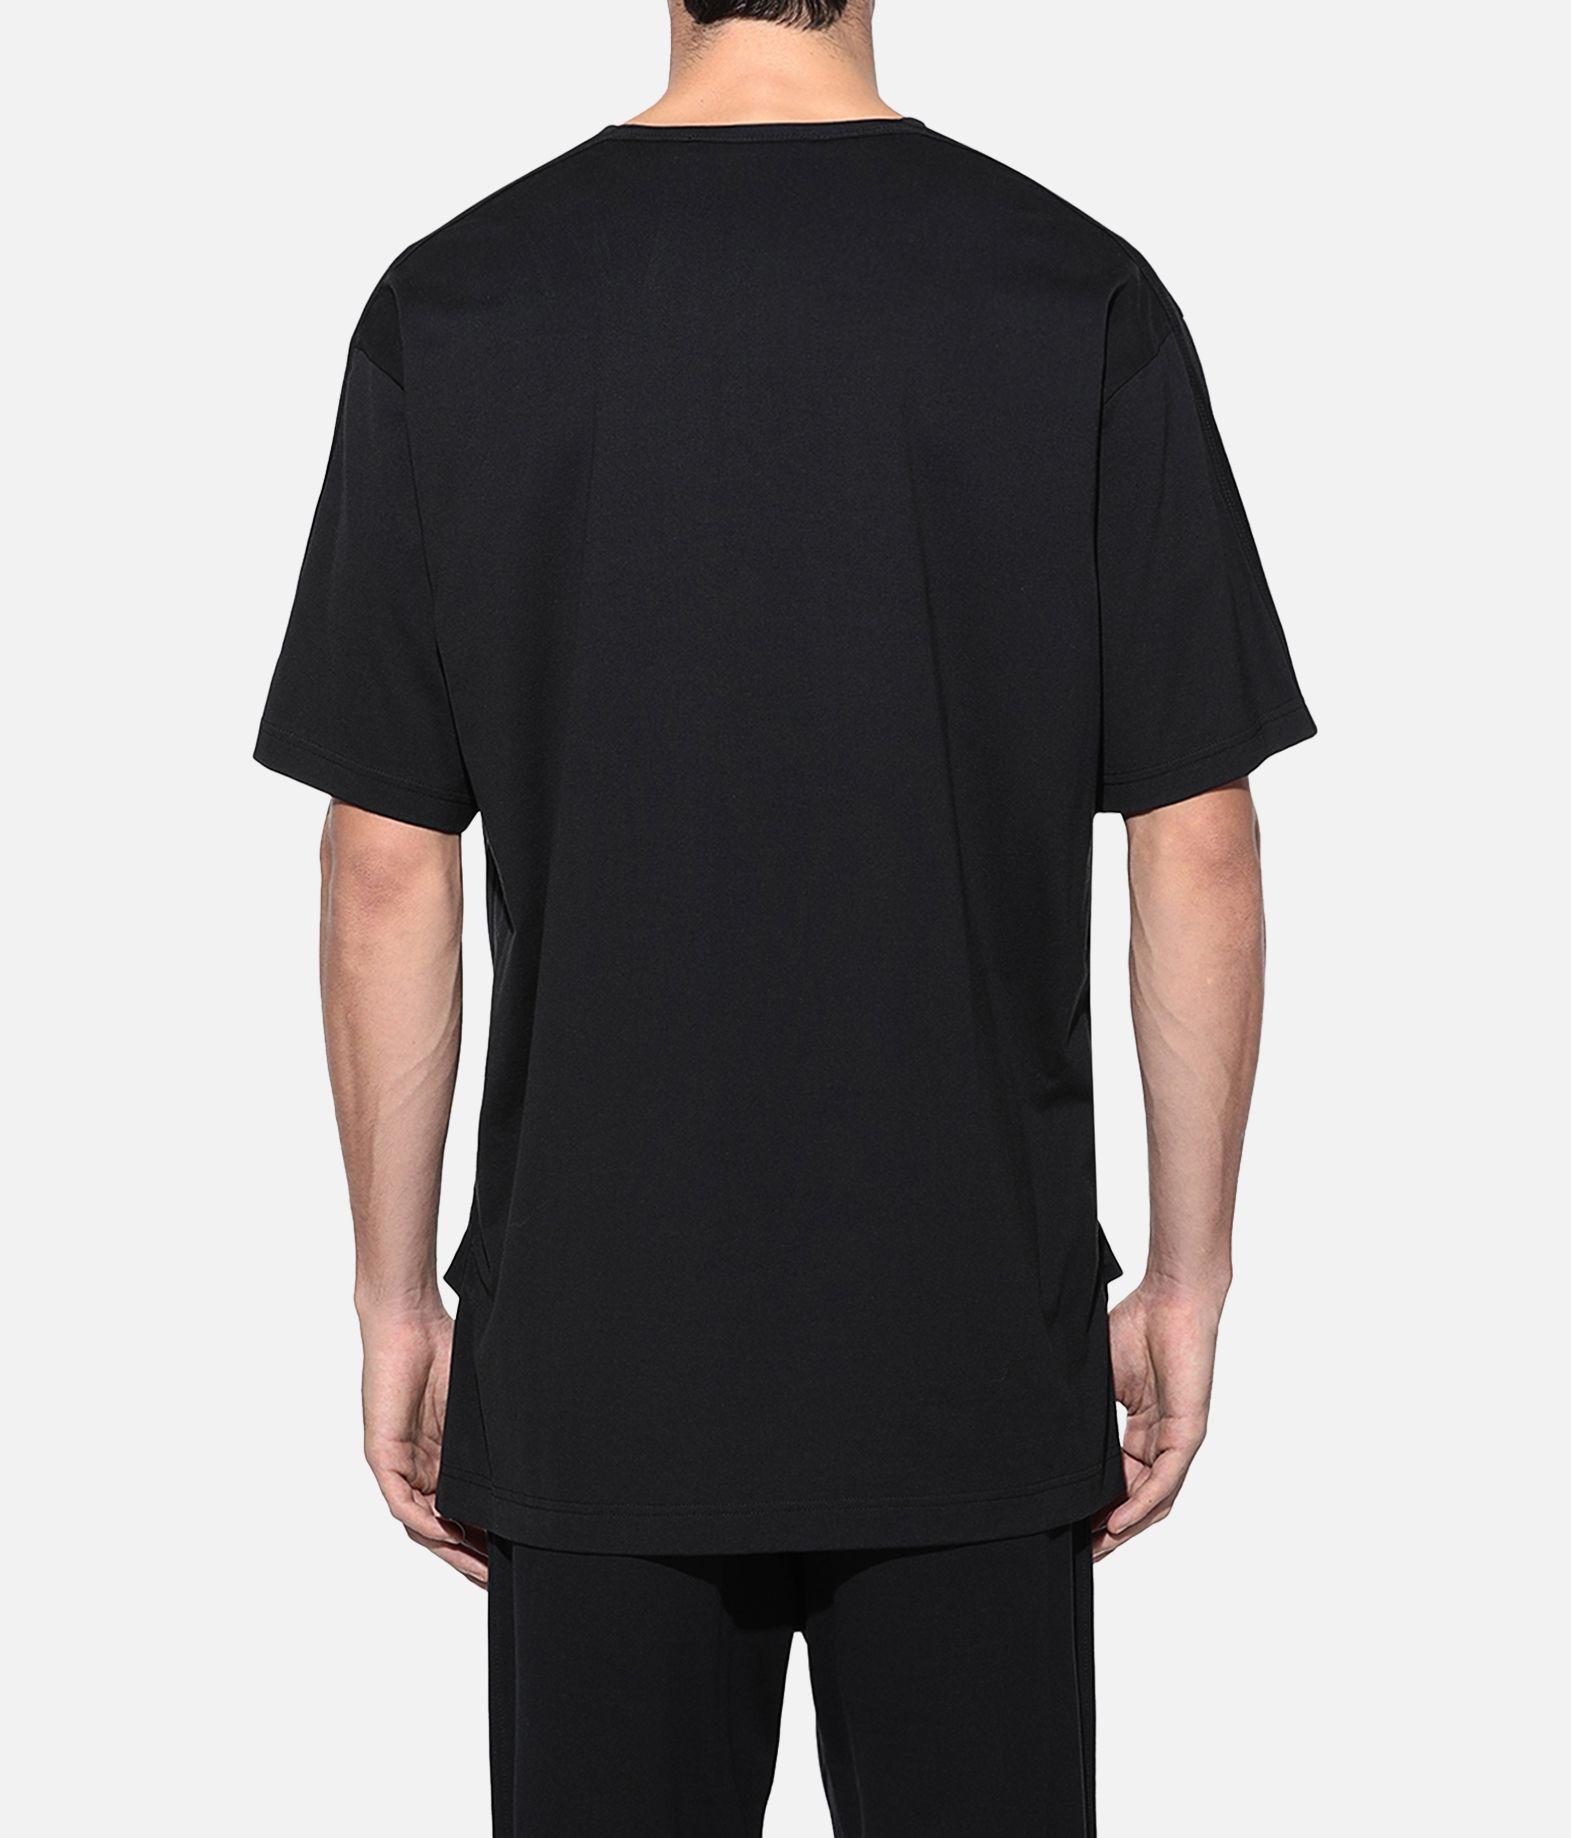 Y-3 Y-3 Parachute Tee Short sleeve t-shirt Man d